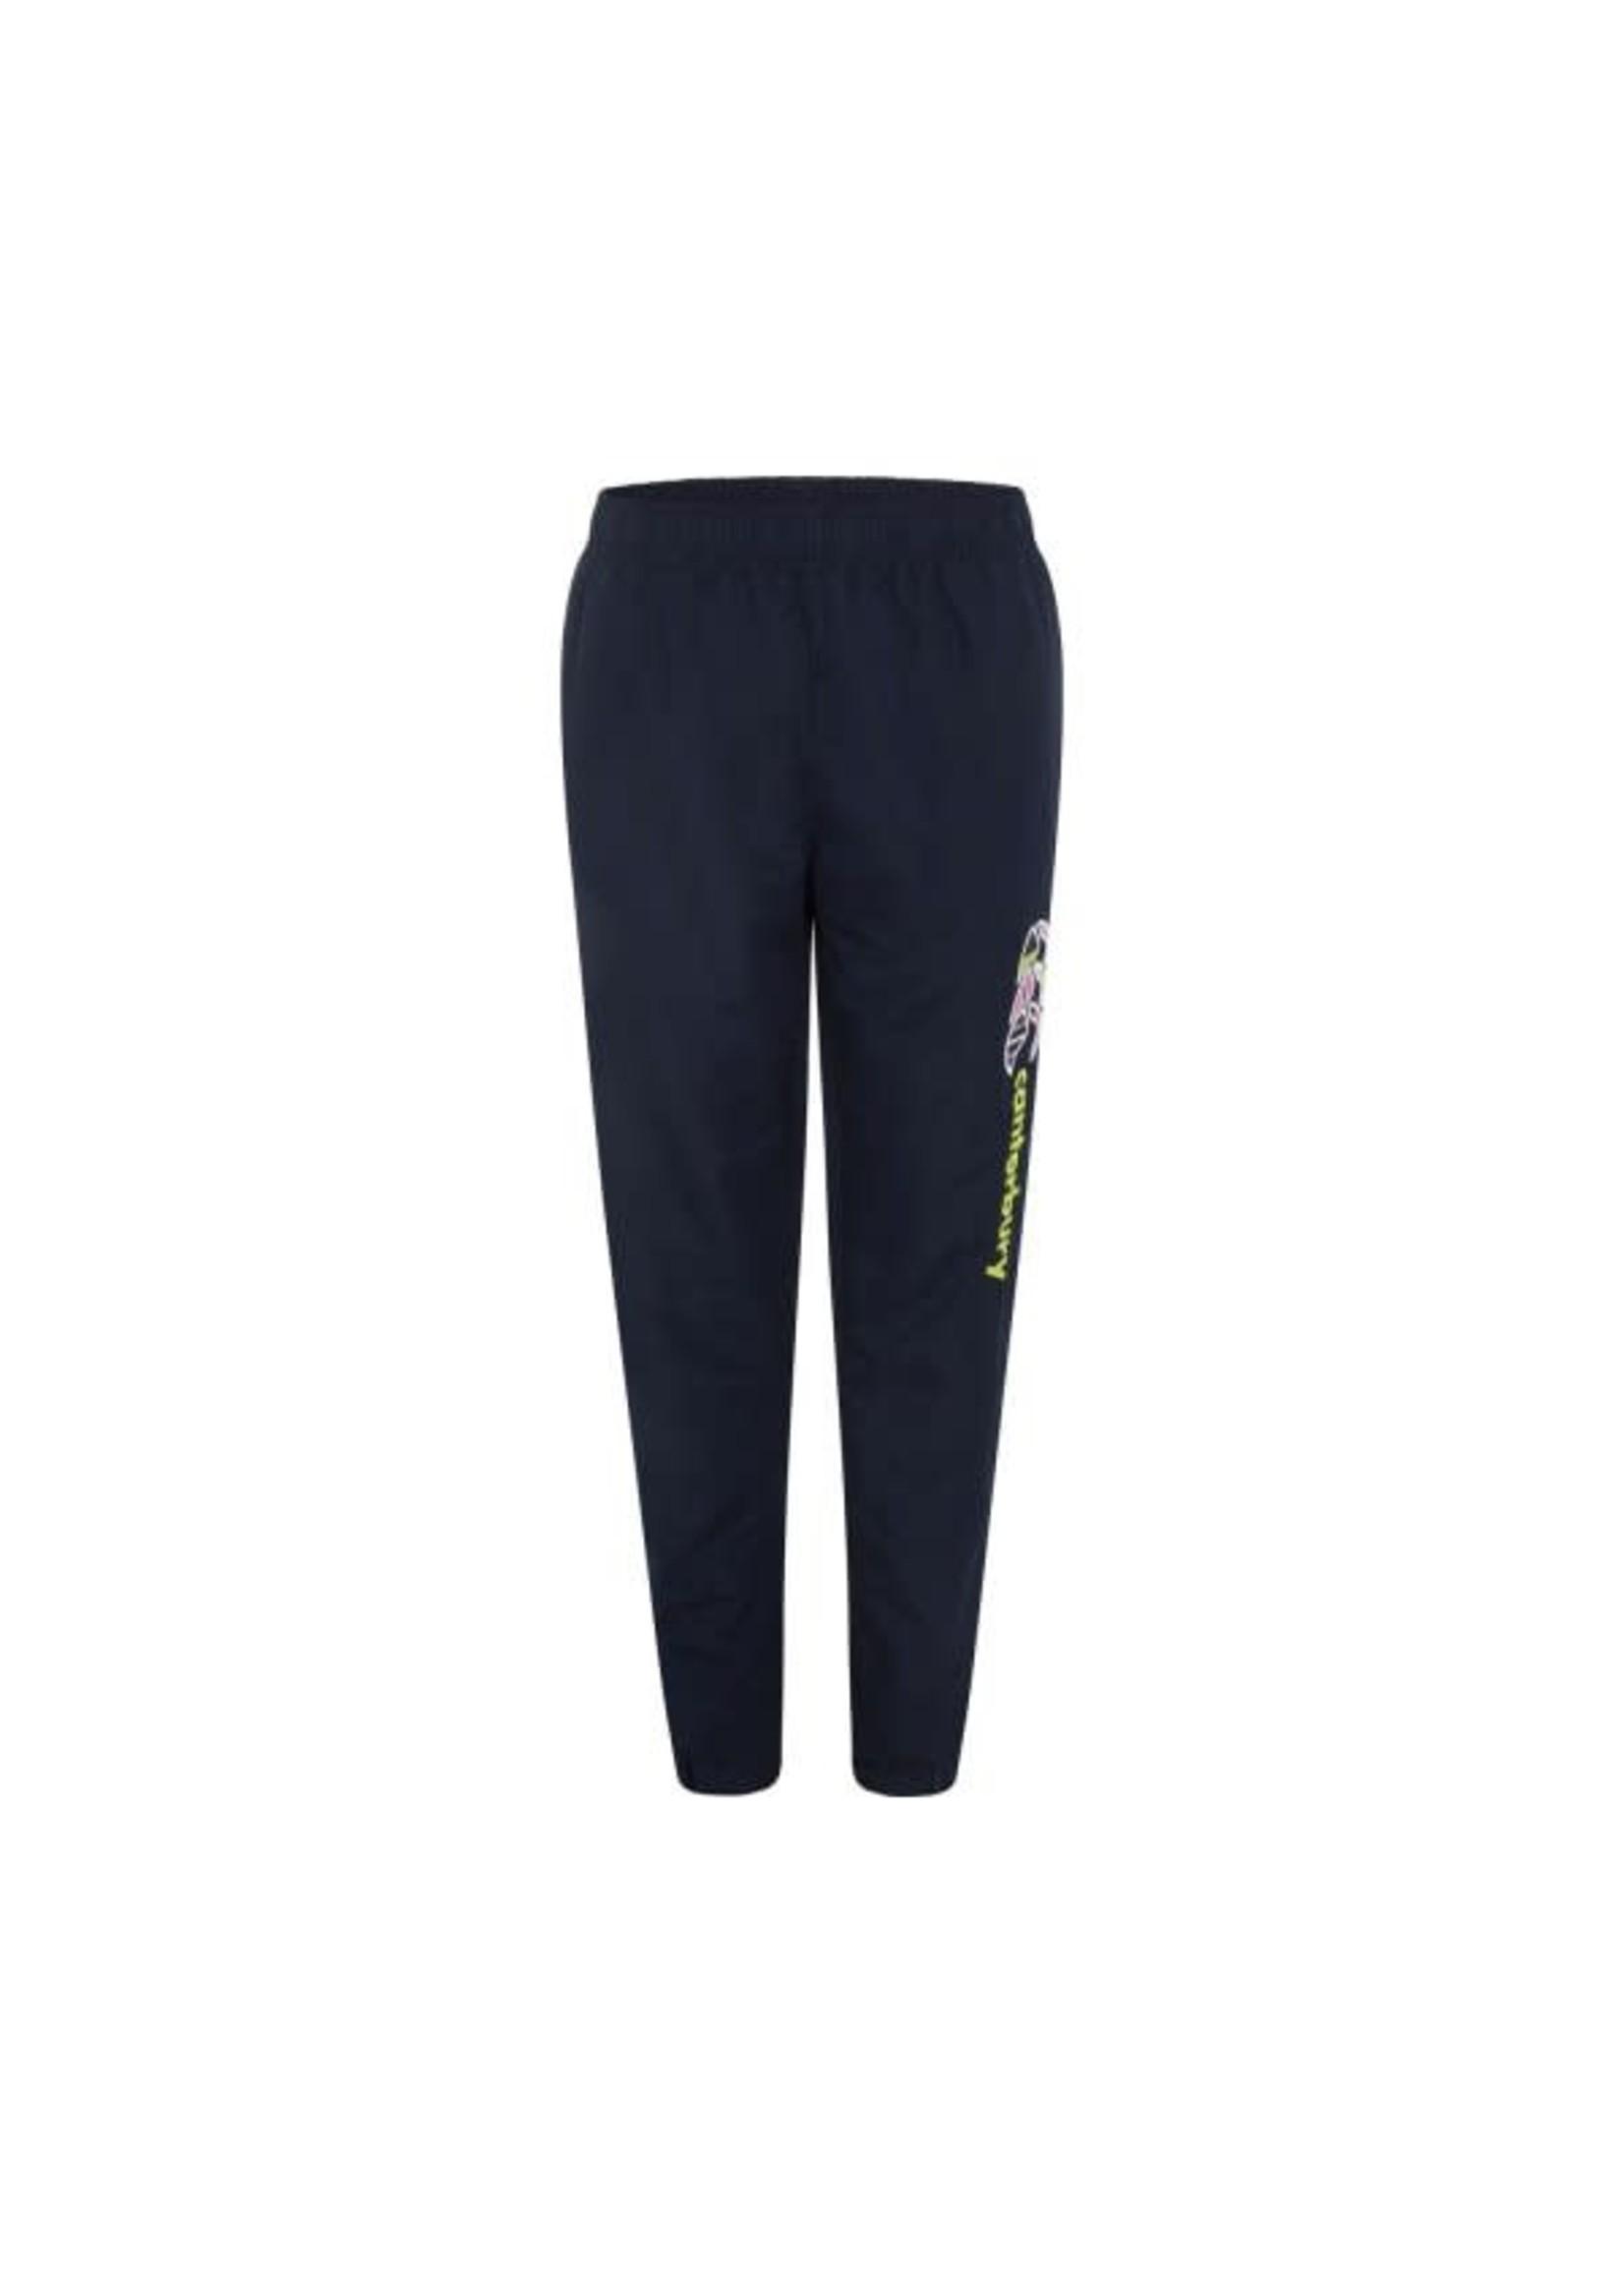 Canterbury Canterbury Ladies Uglies Tapered Cuff Pant (2020/21), Navy/Pink/Green